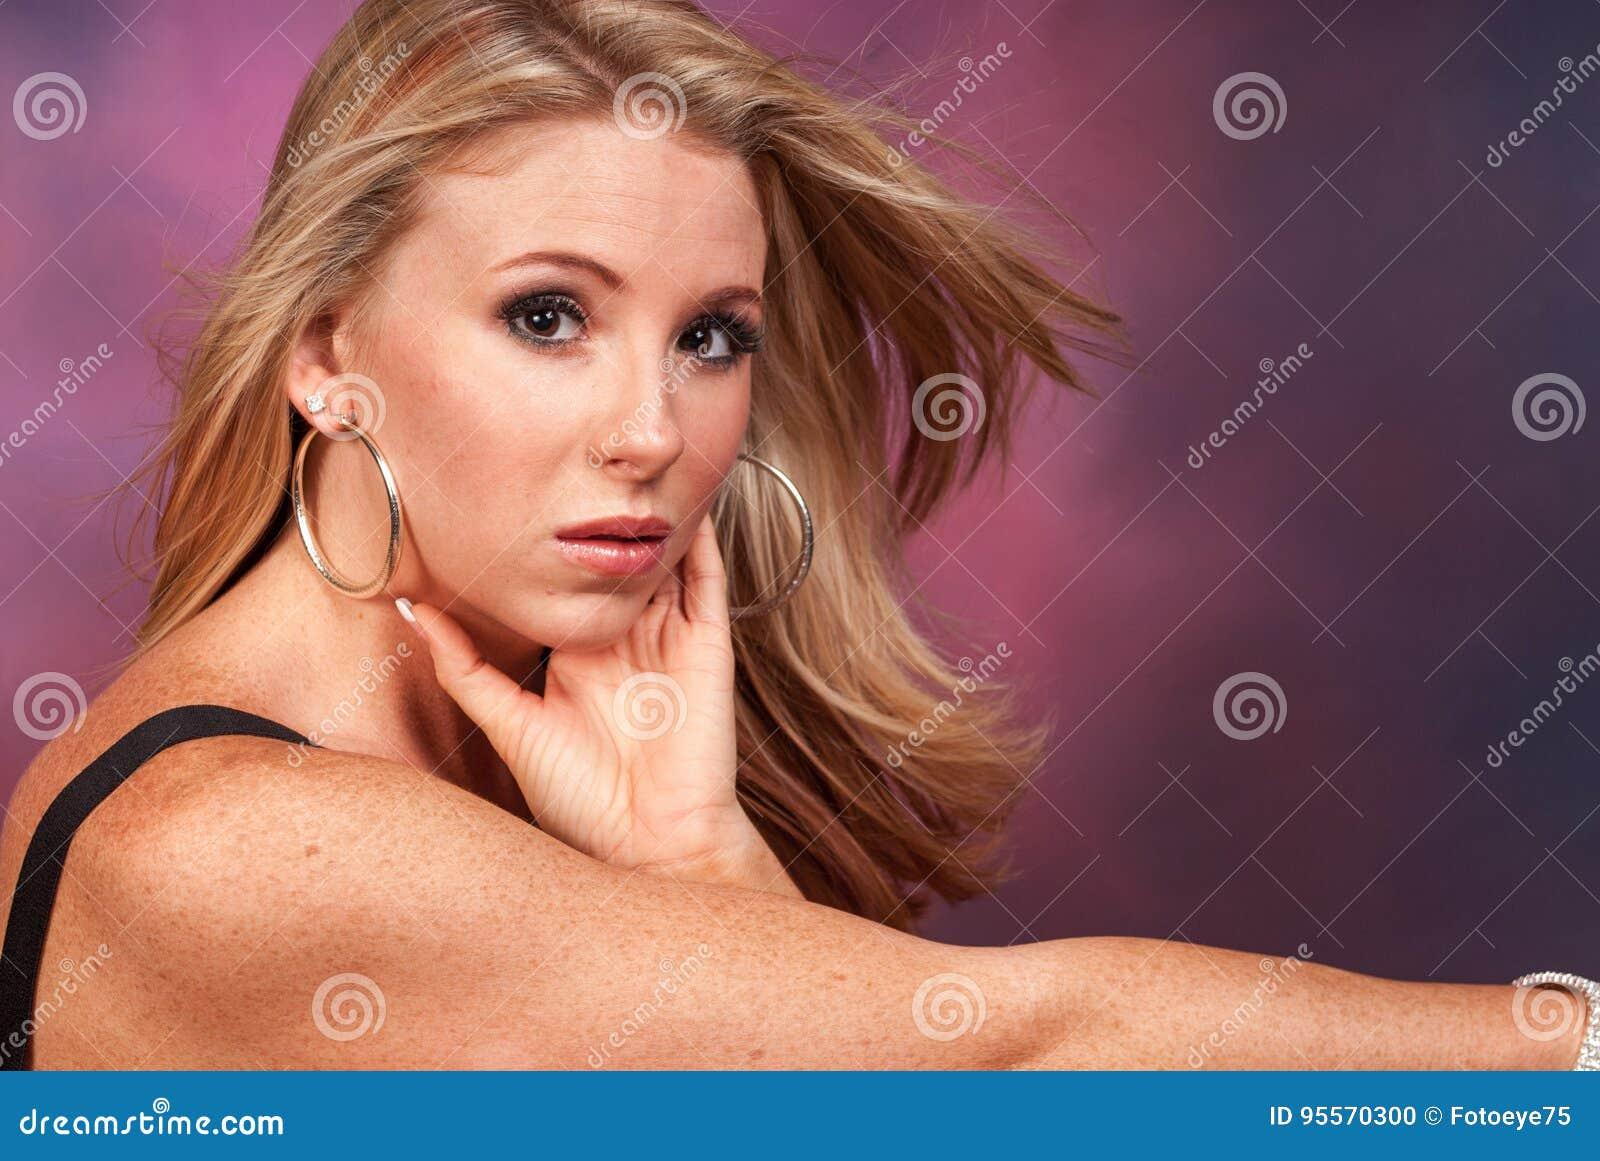 Short blonde woman big real boobs